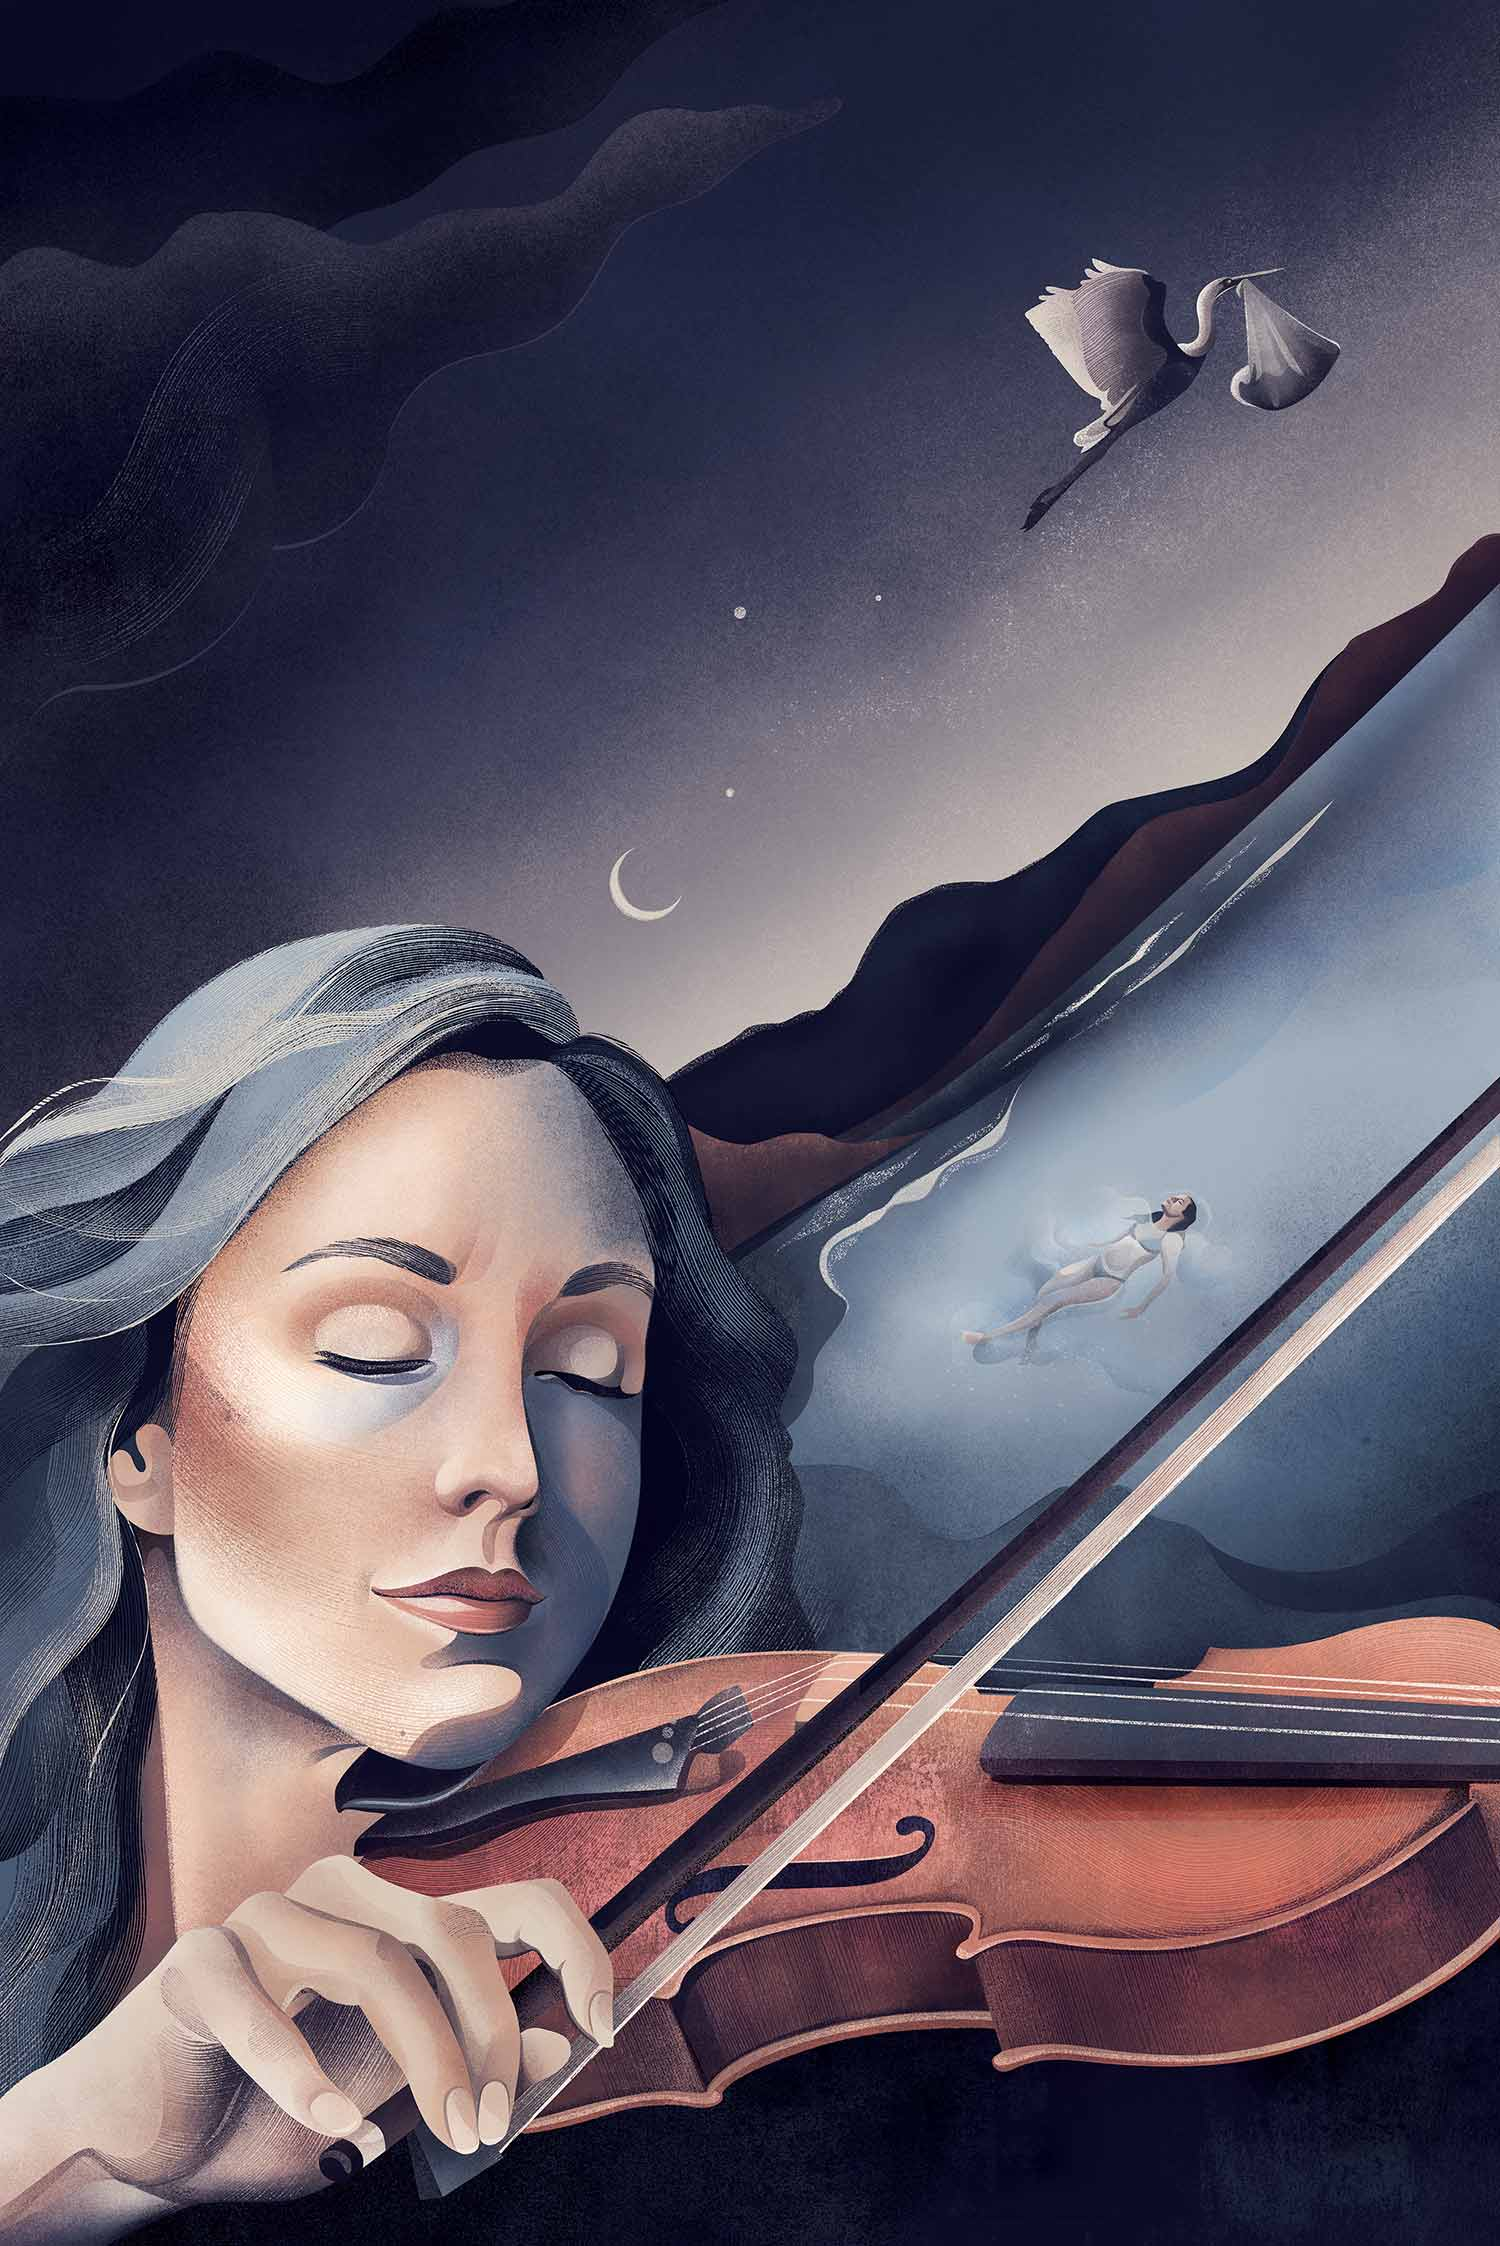 Woman-Violin-Karla-Sanders-Illustration.jpg